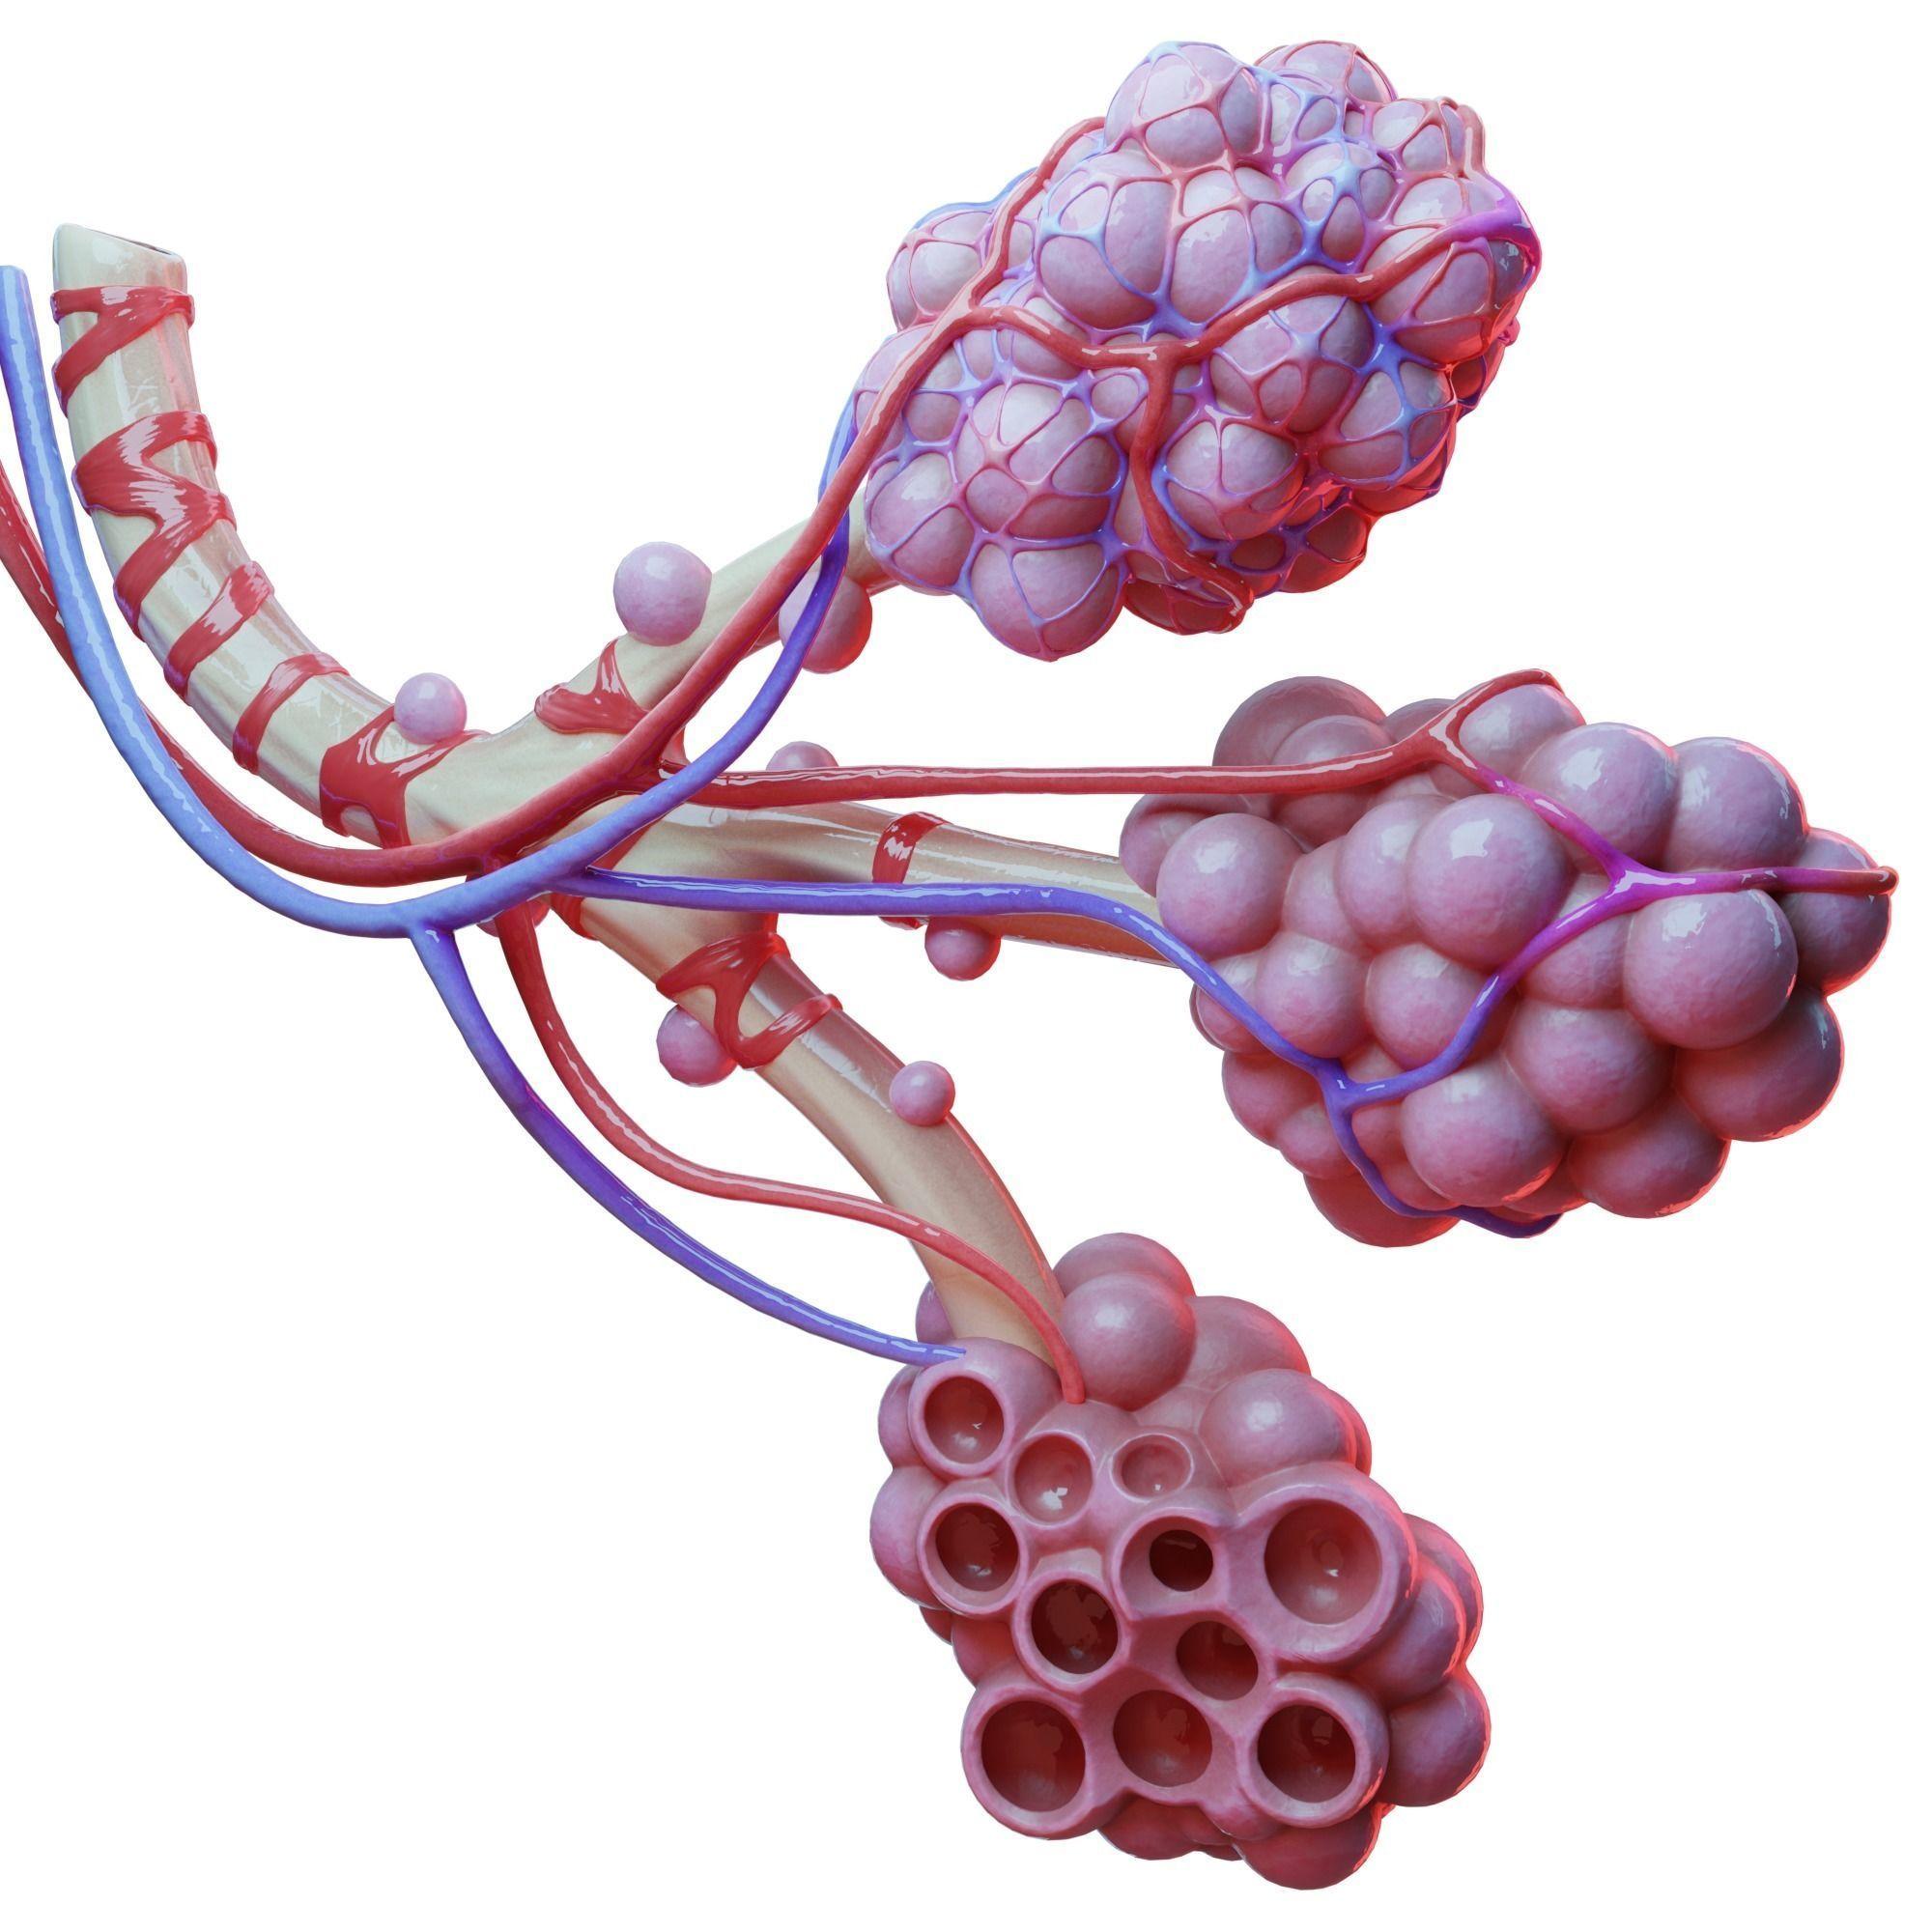 Realistic Human Bronchi Alveoli Anatomy